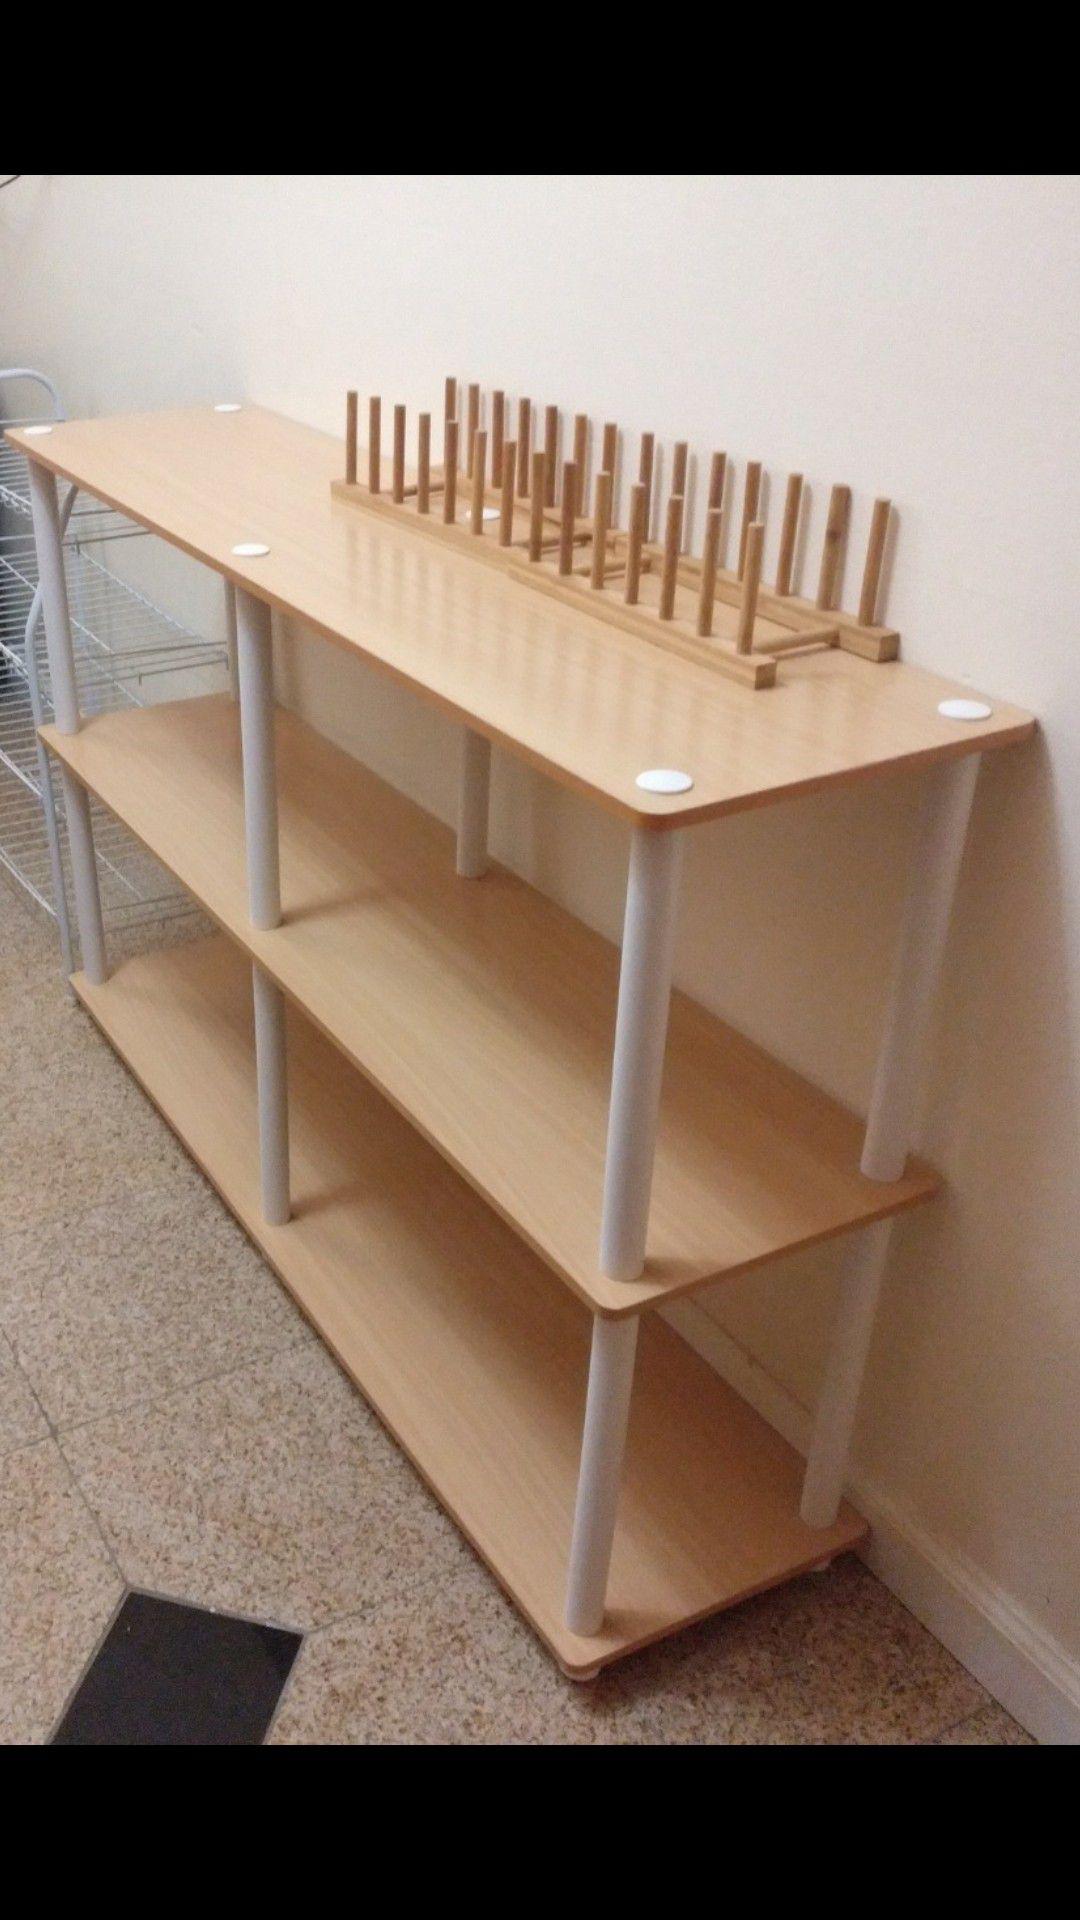 3 Tier storage display rack